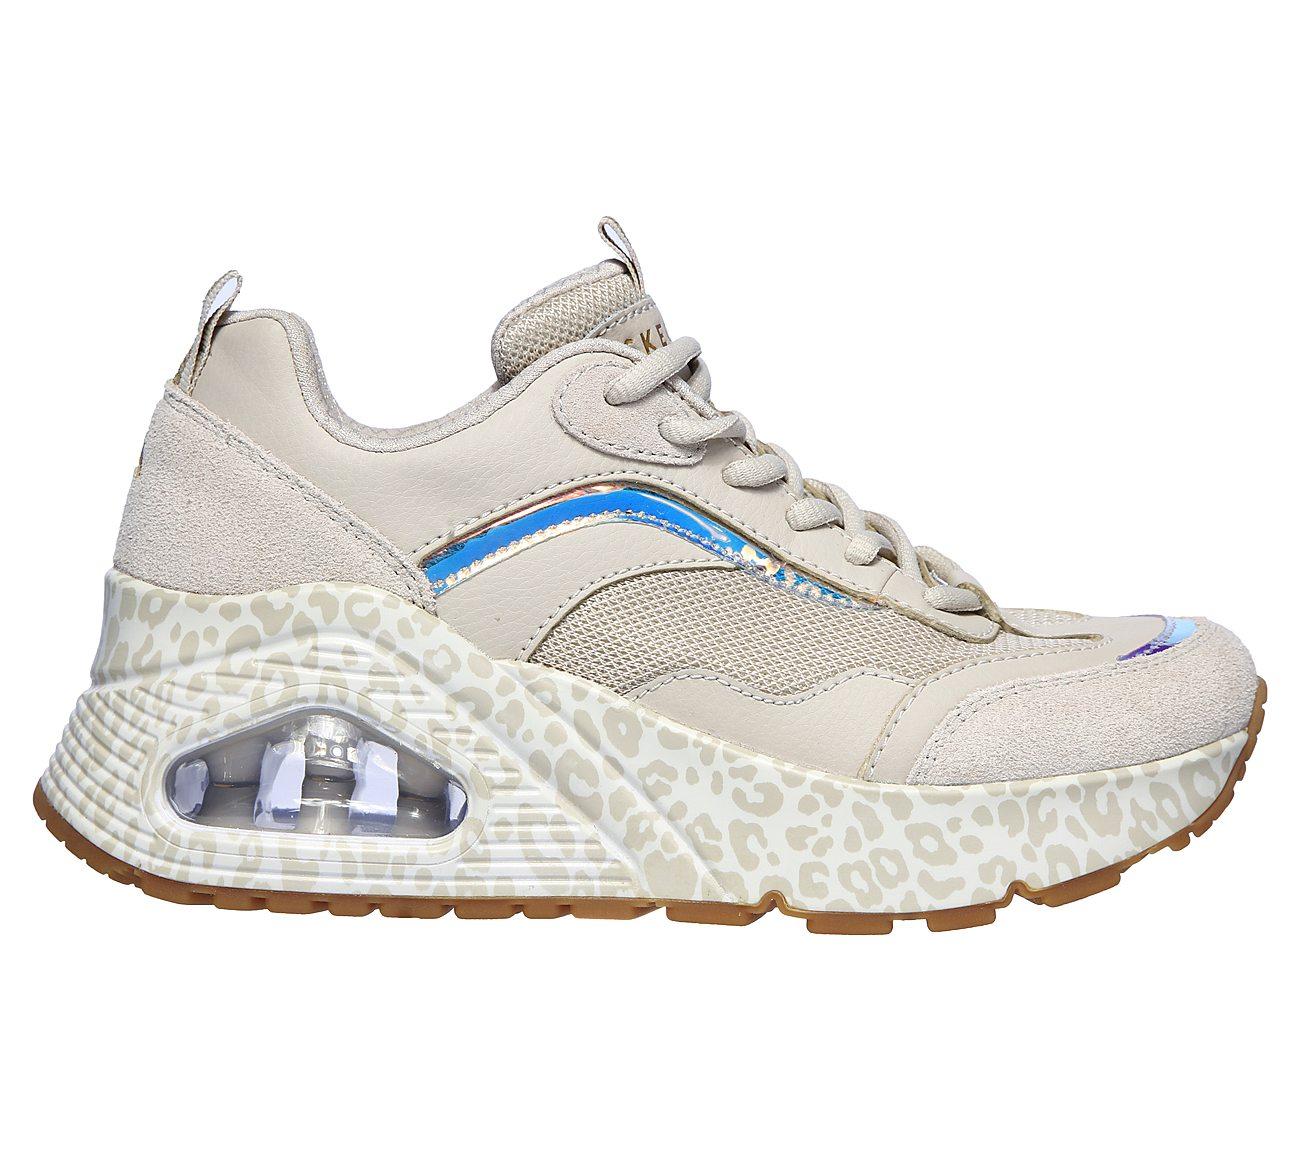 Uno Hi - Incatnito SKECHER Street Shoes